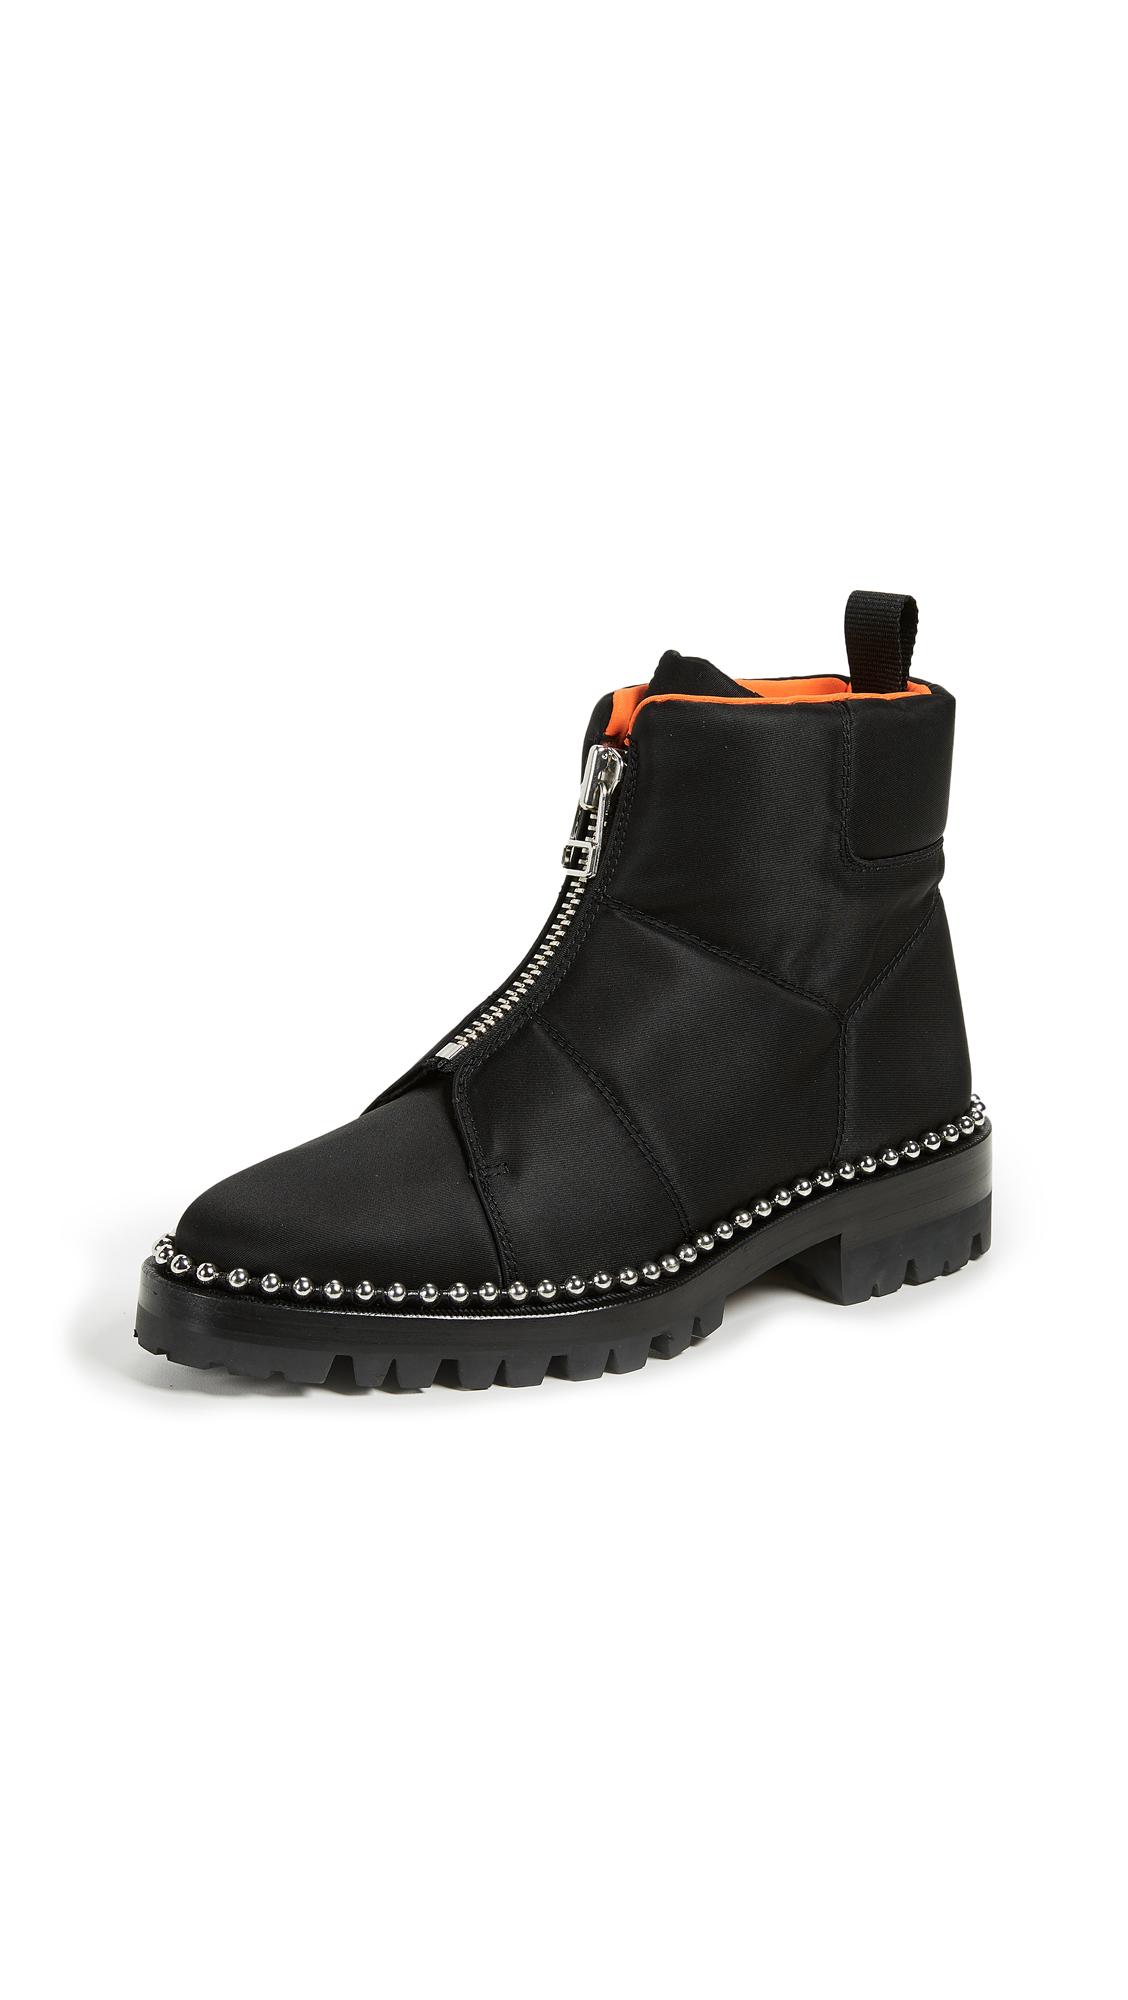 Alexander Wang Cooper Boots - Black